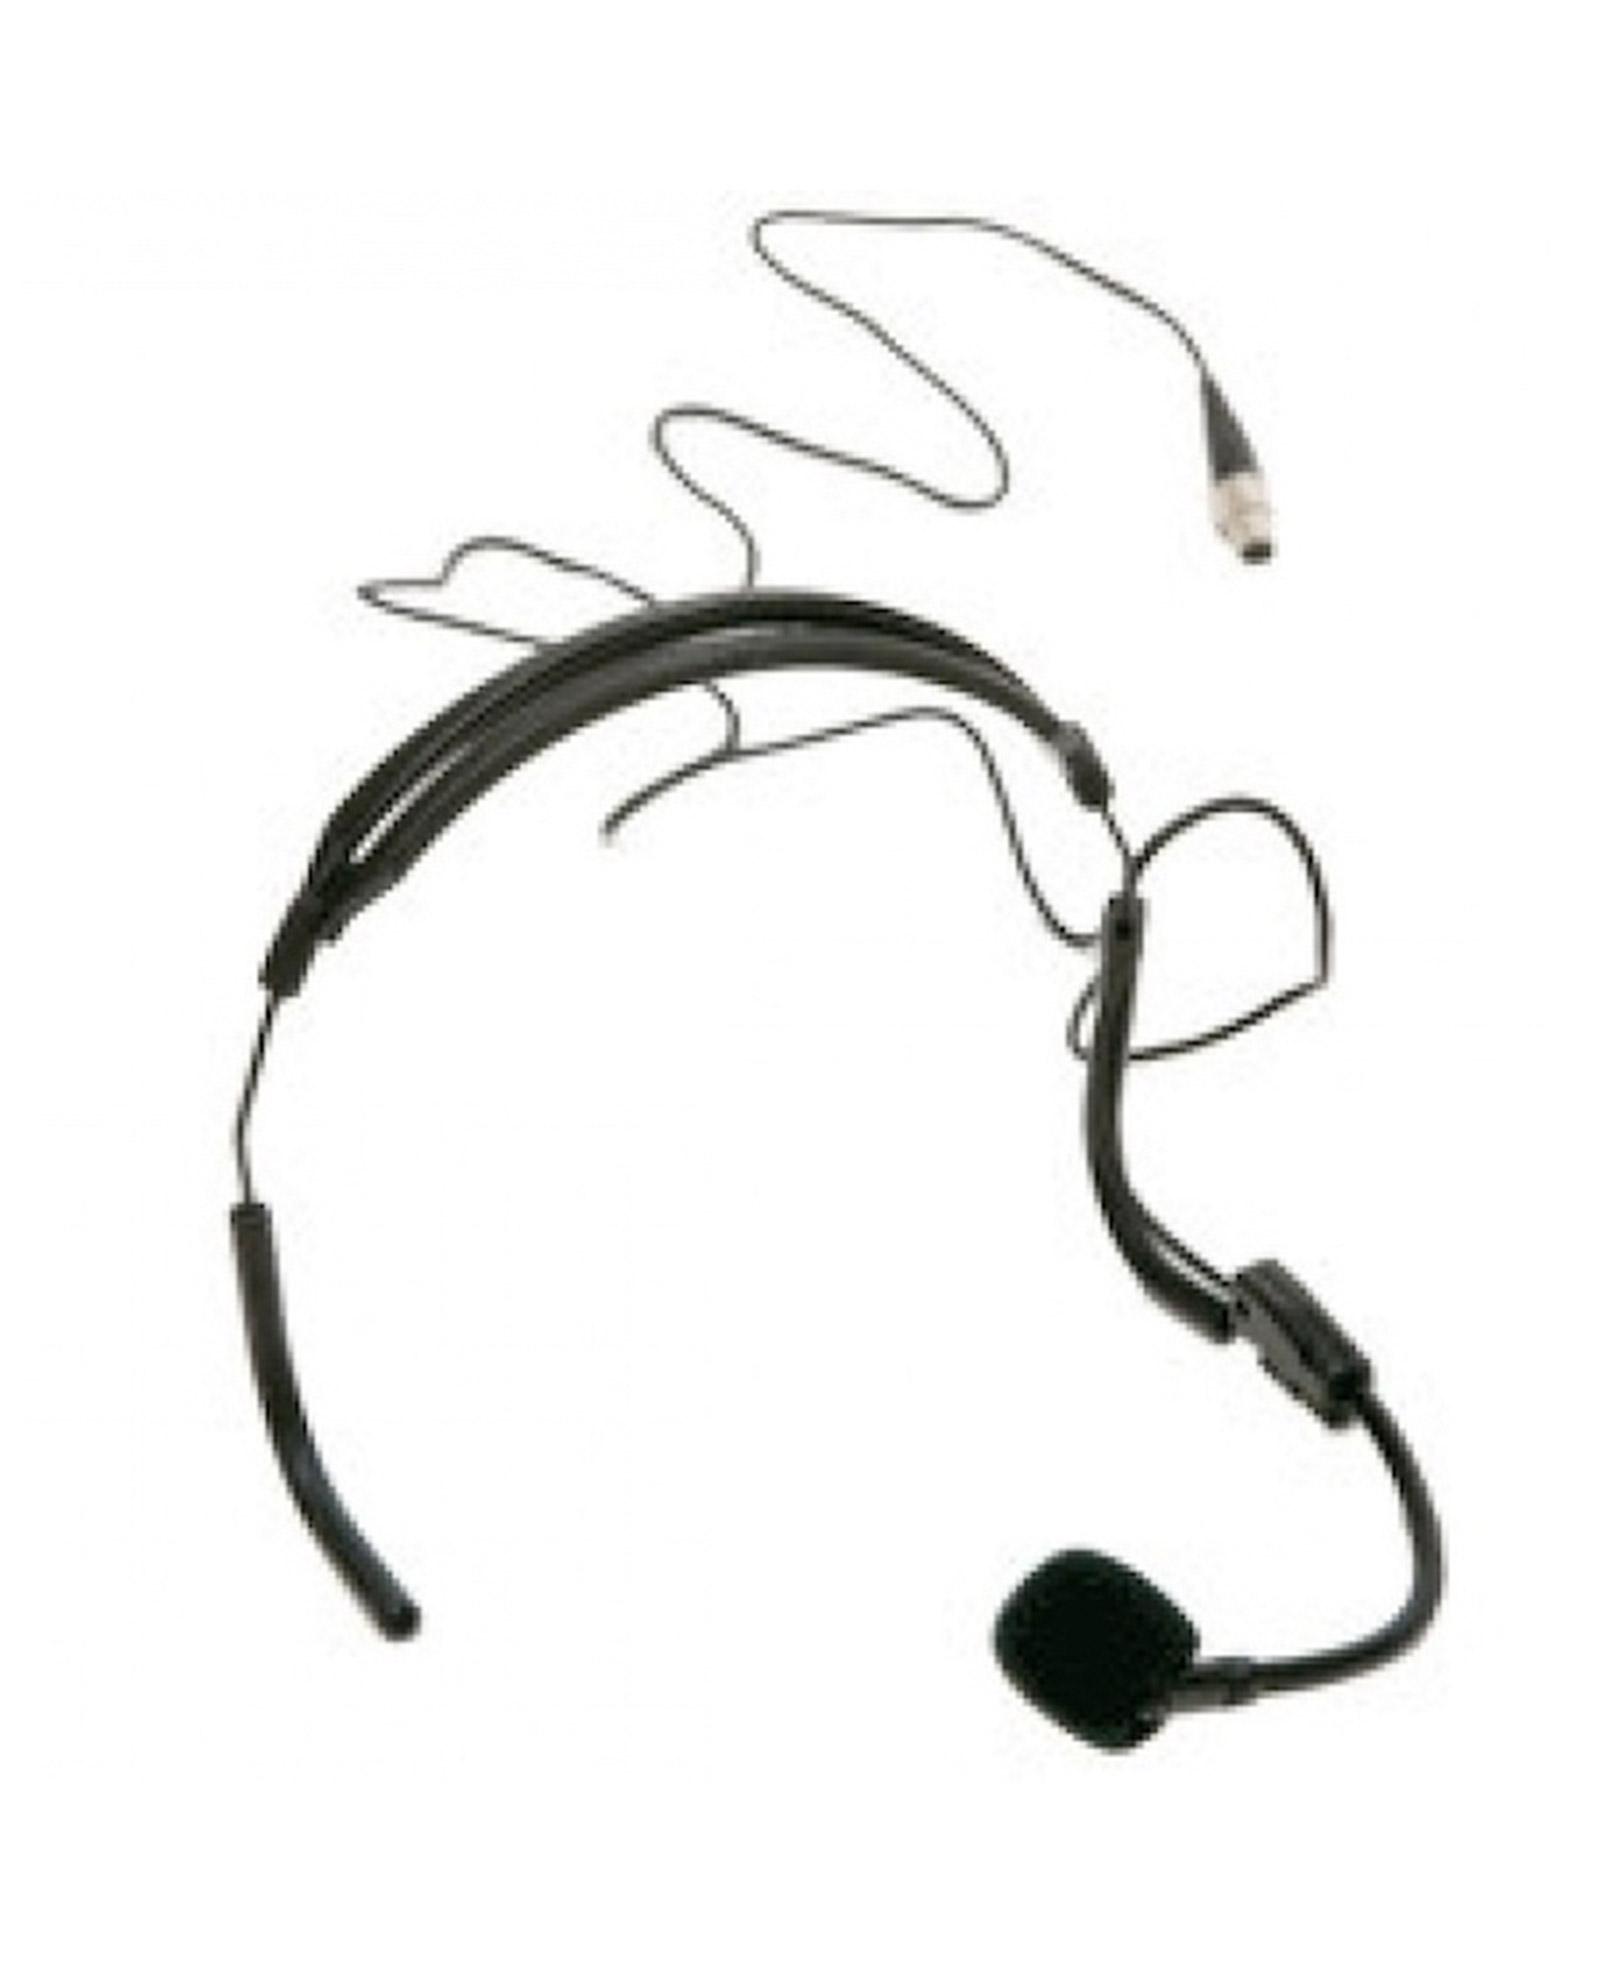 Ashton Awm350htbp Dual System – Handheld & Beltpack 2